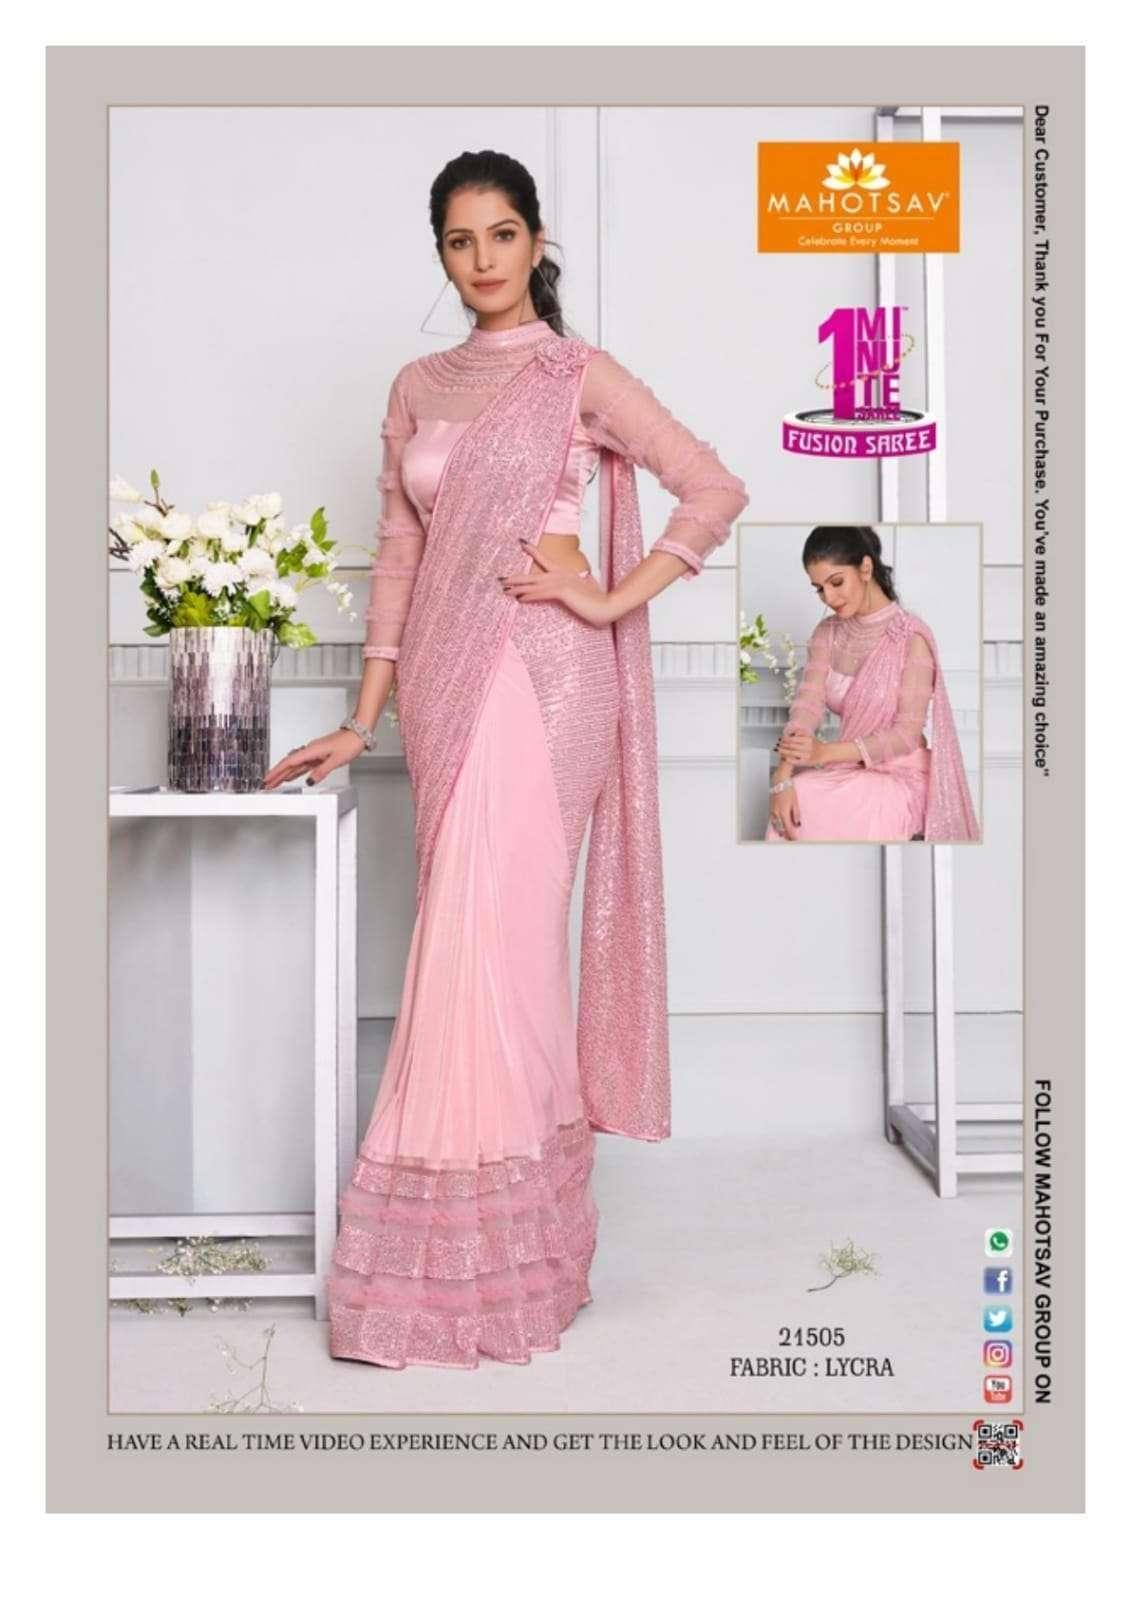 Mahotsav Moh Manthan Izzara 21501 To 215018 Series Fancy Designer Sarees Collection 21505